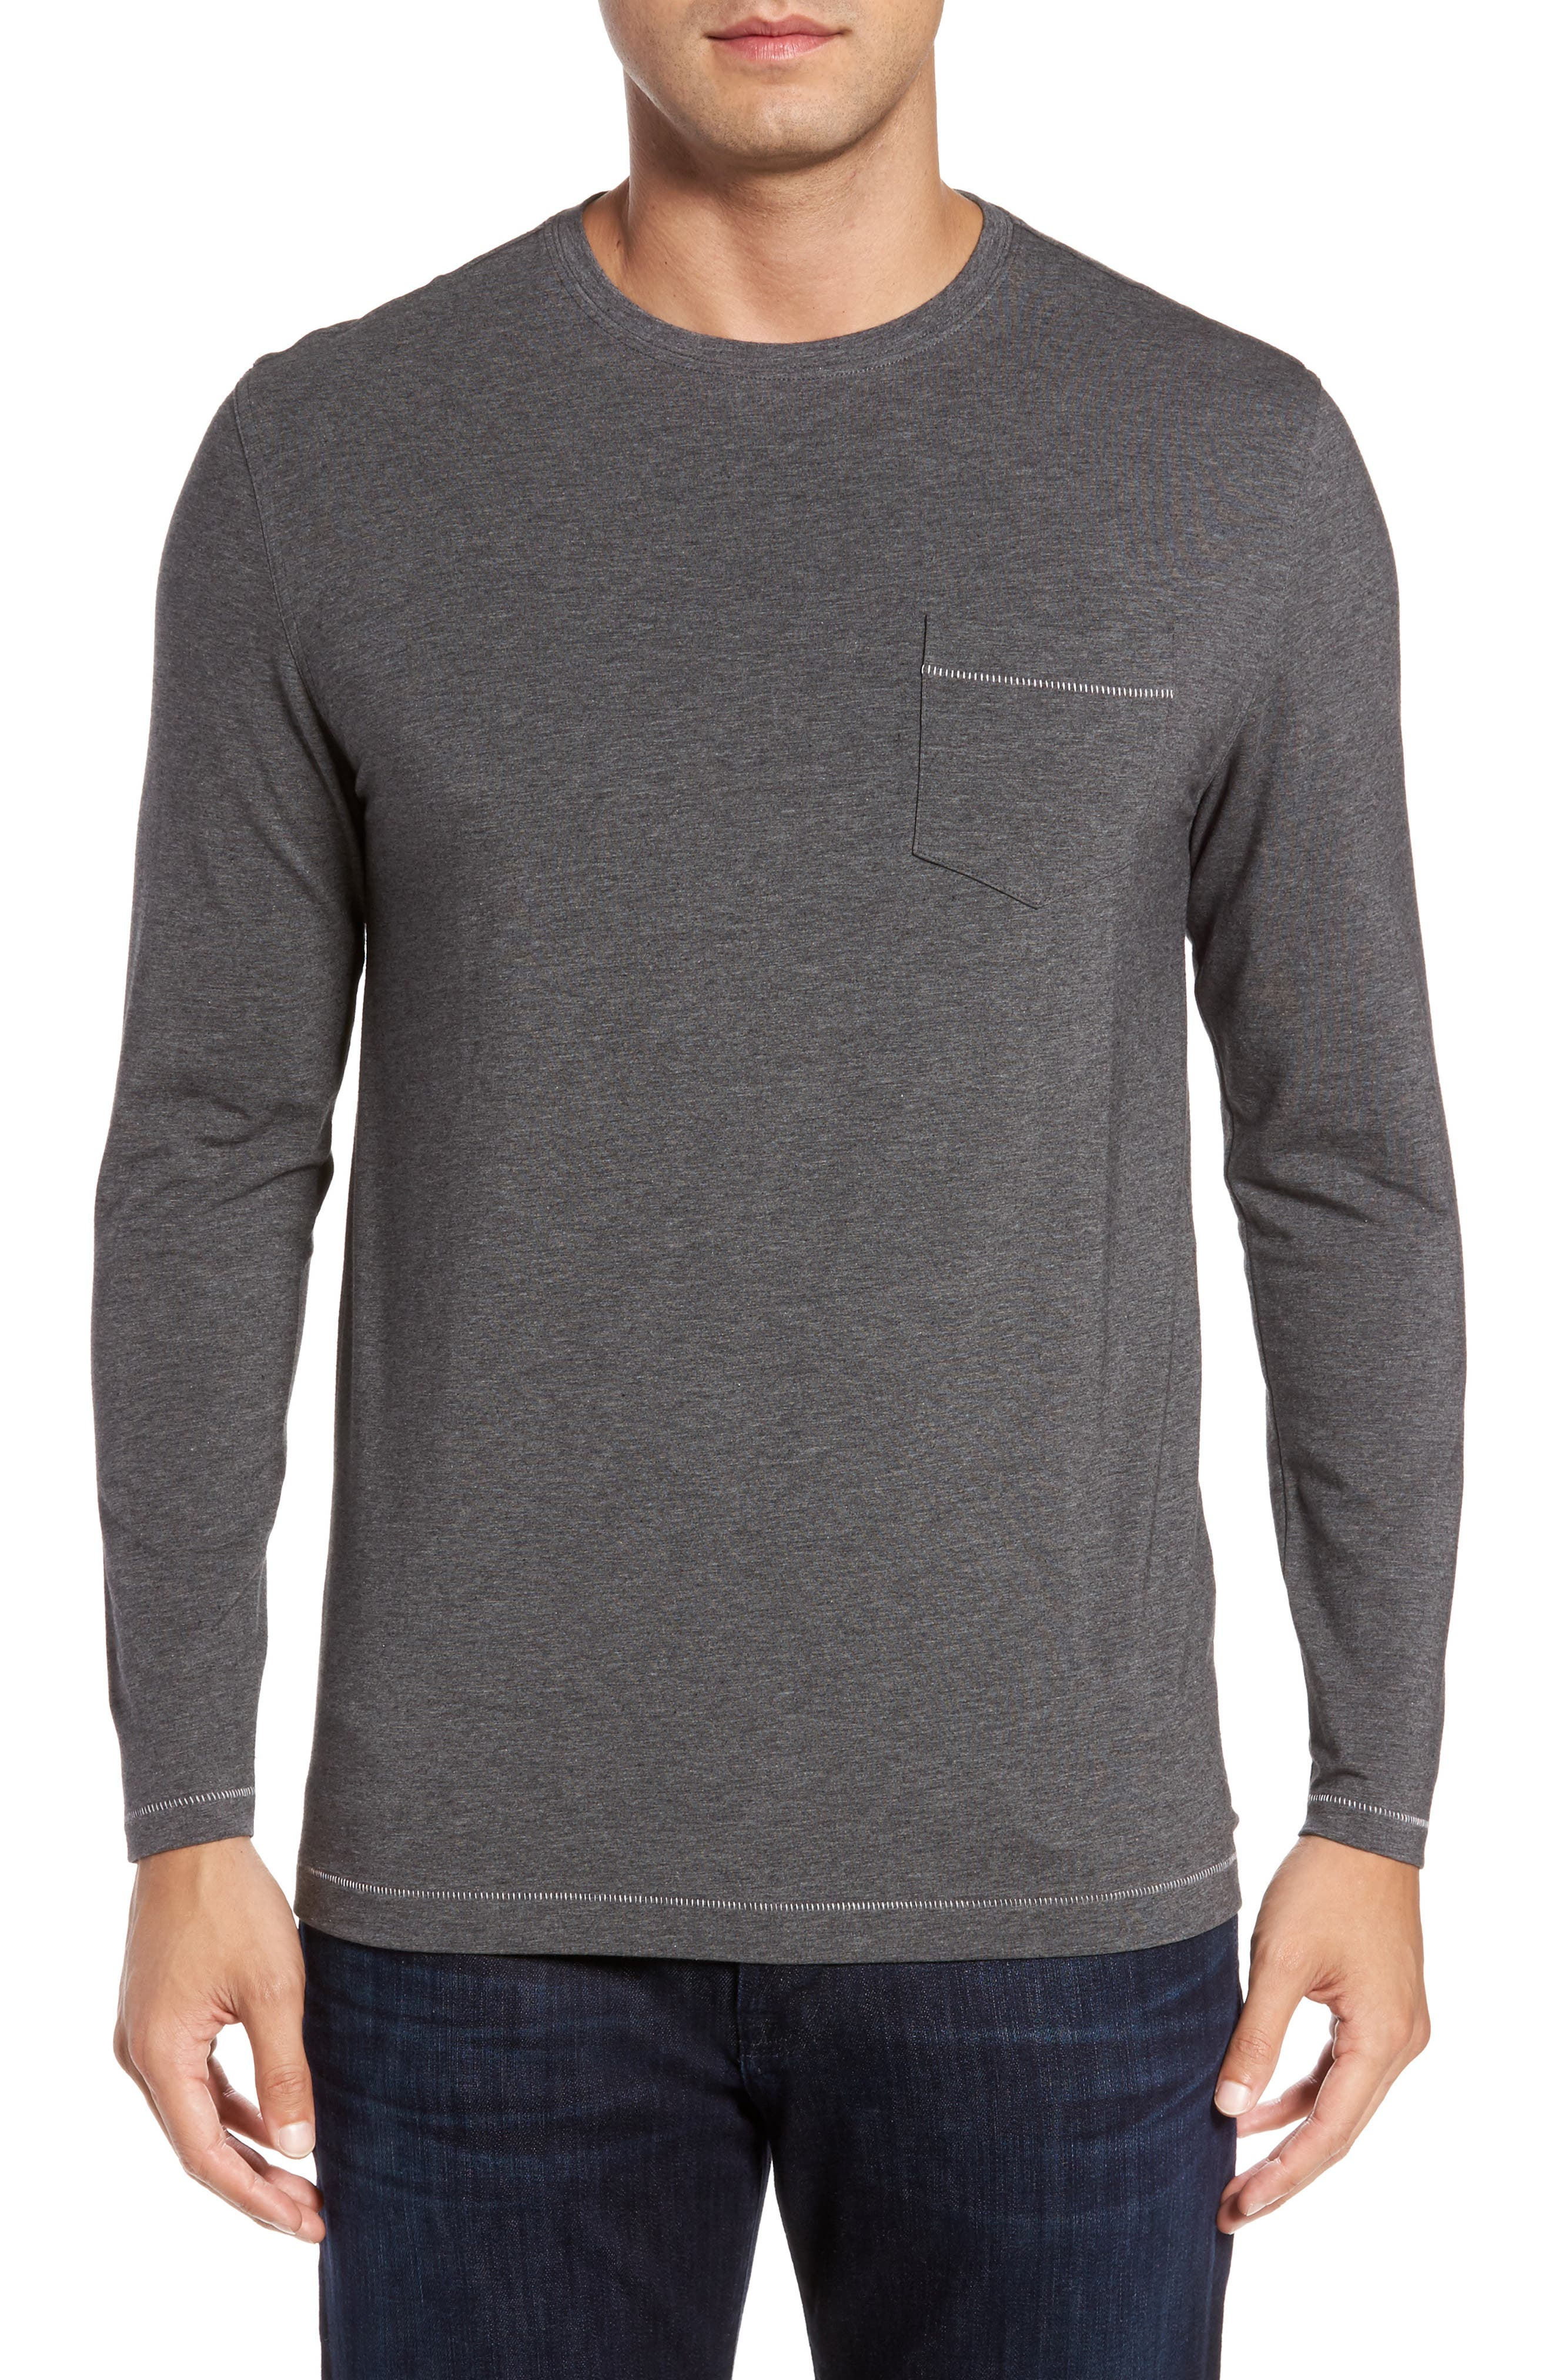 Rule 18 Essential Crewneck T-Shirt,                             Main thumbnail 1, color,                             020